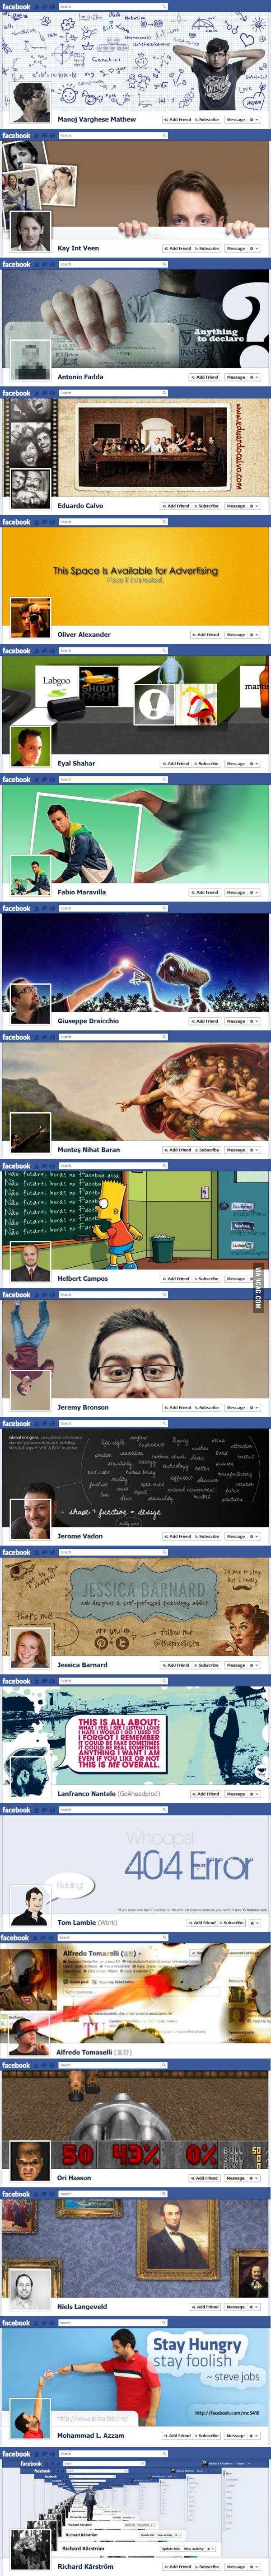 Facebook Timeline Cover Win